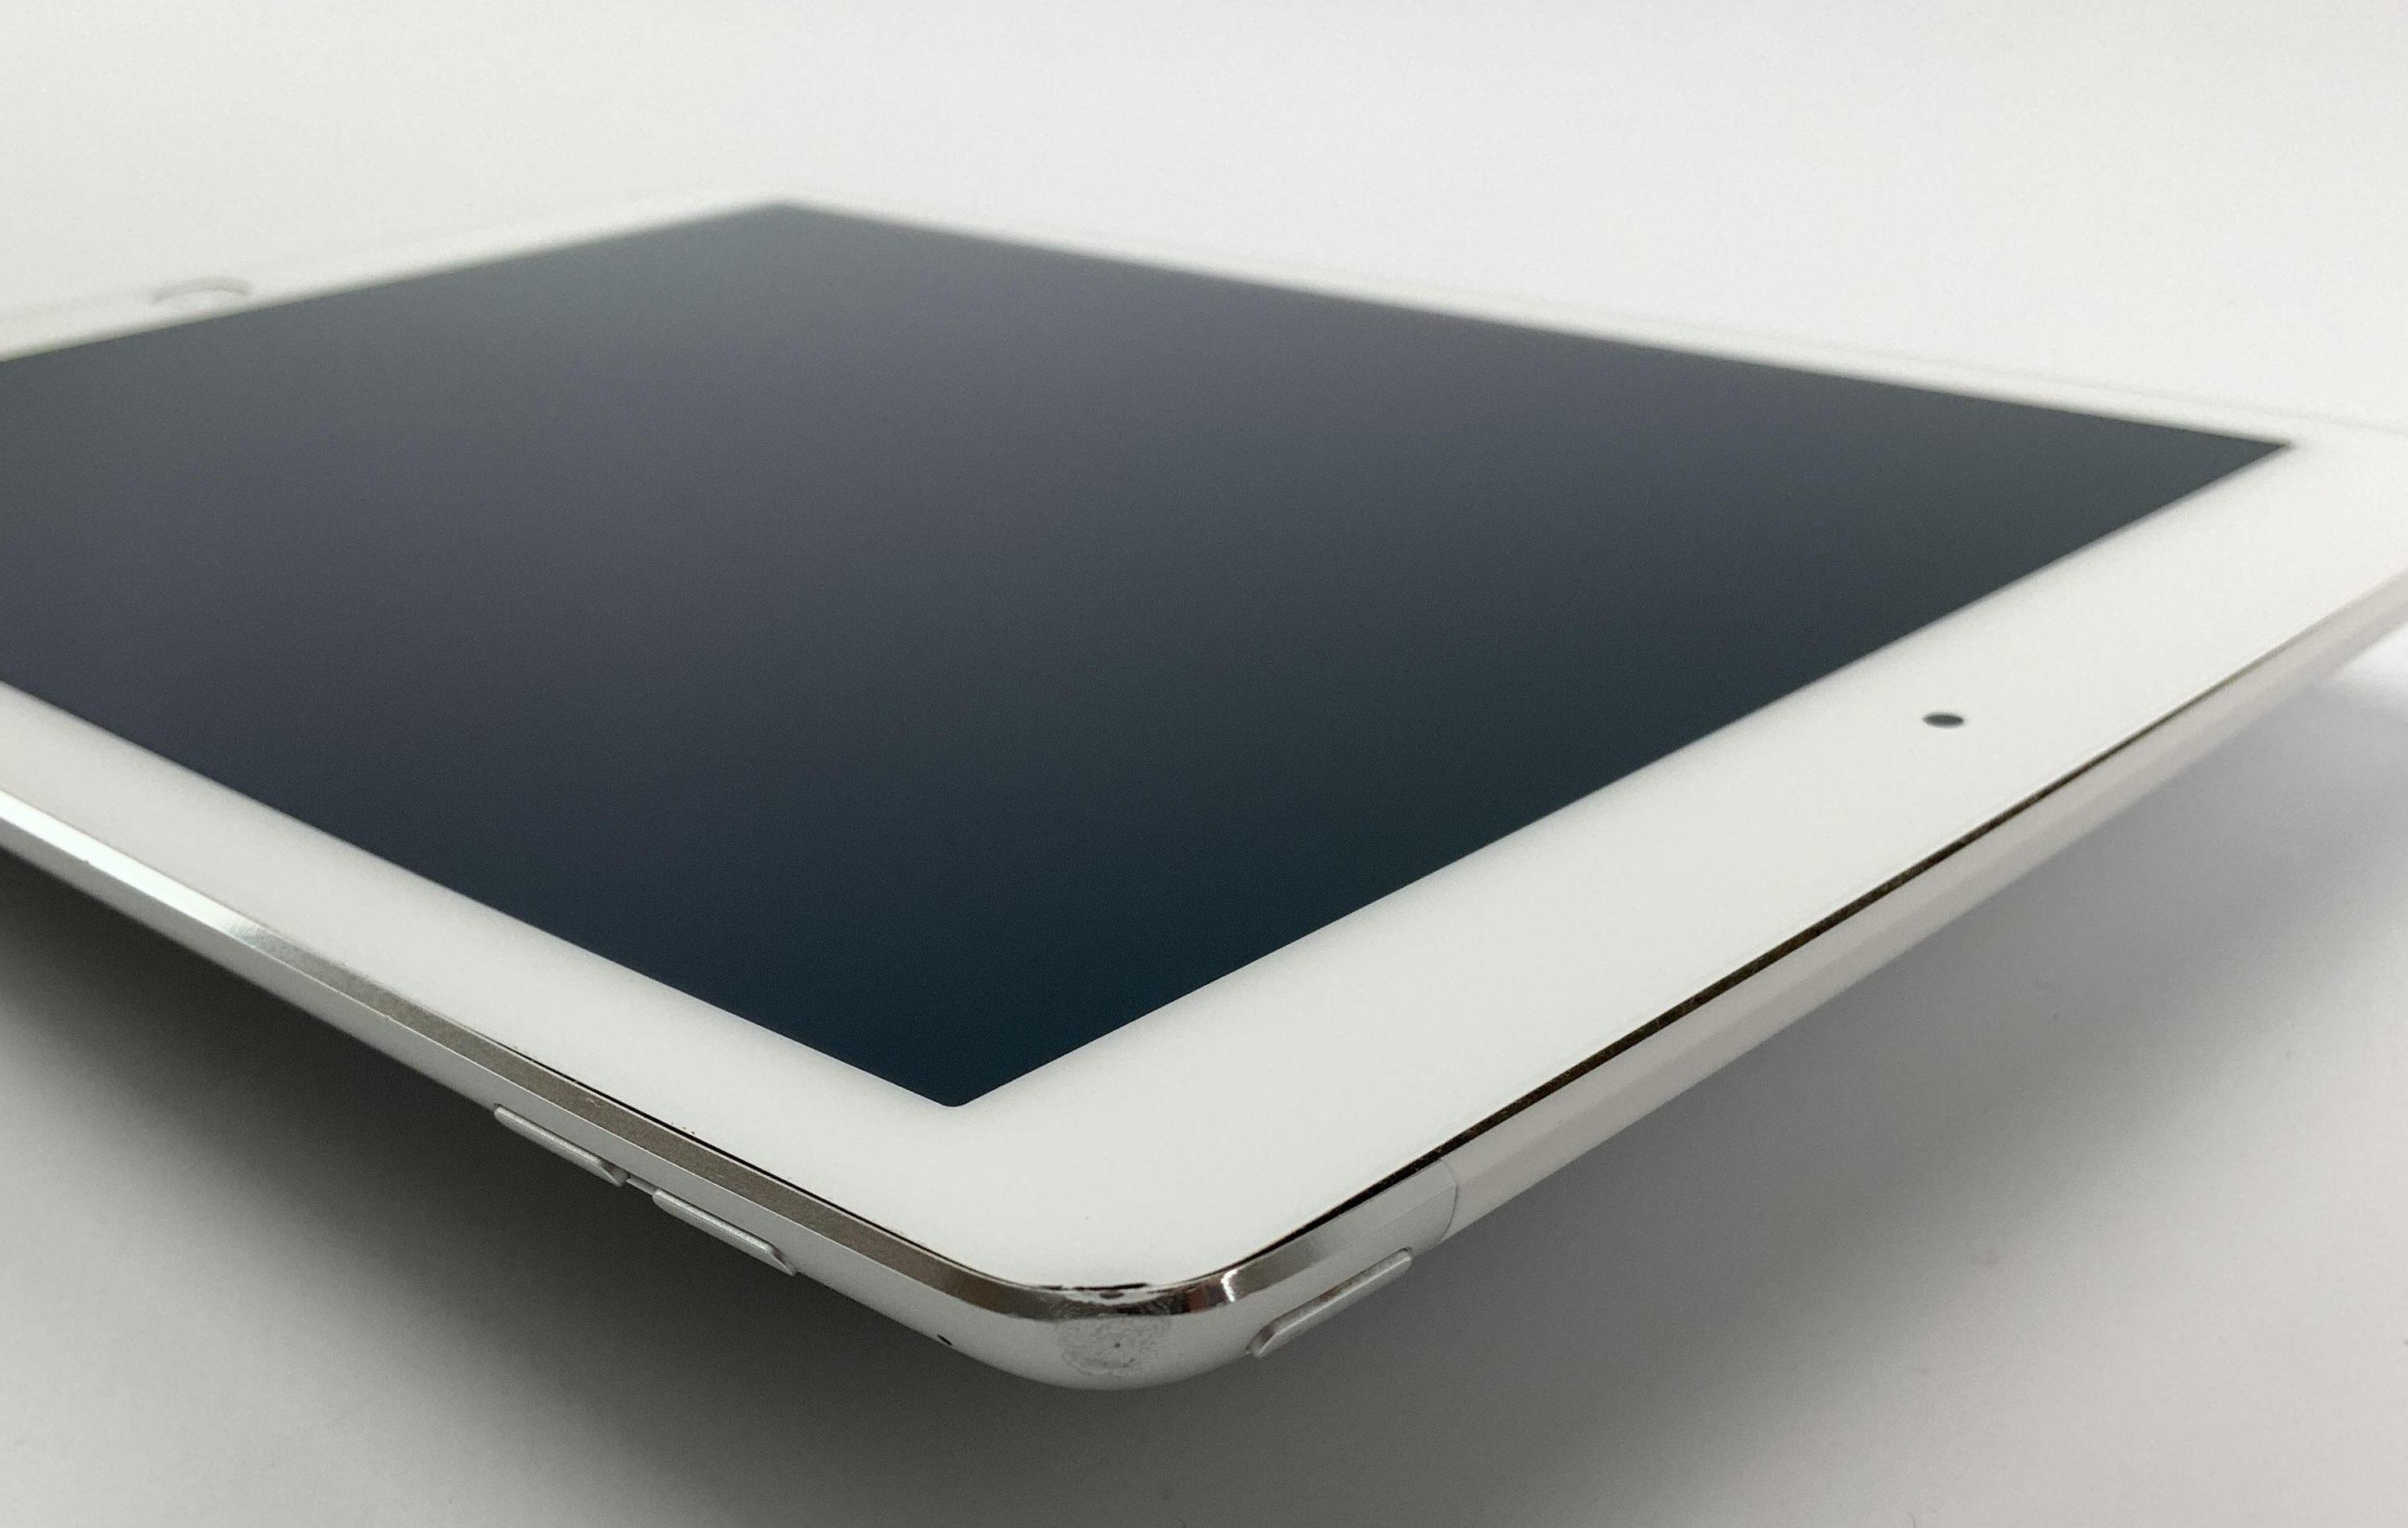 iPad Air 2 Wi-Fi + Cellular 16GB, 16GB, Silver, Afbeelding 3